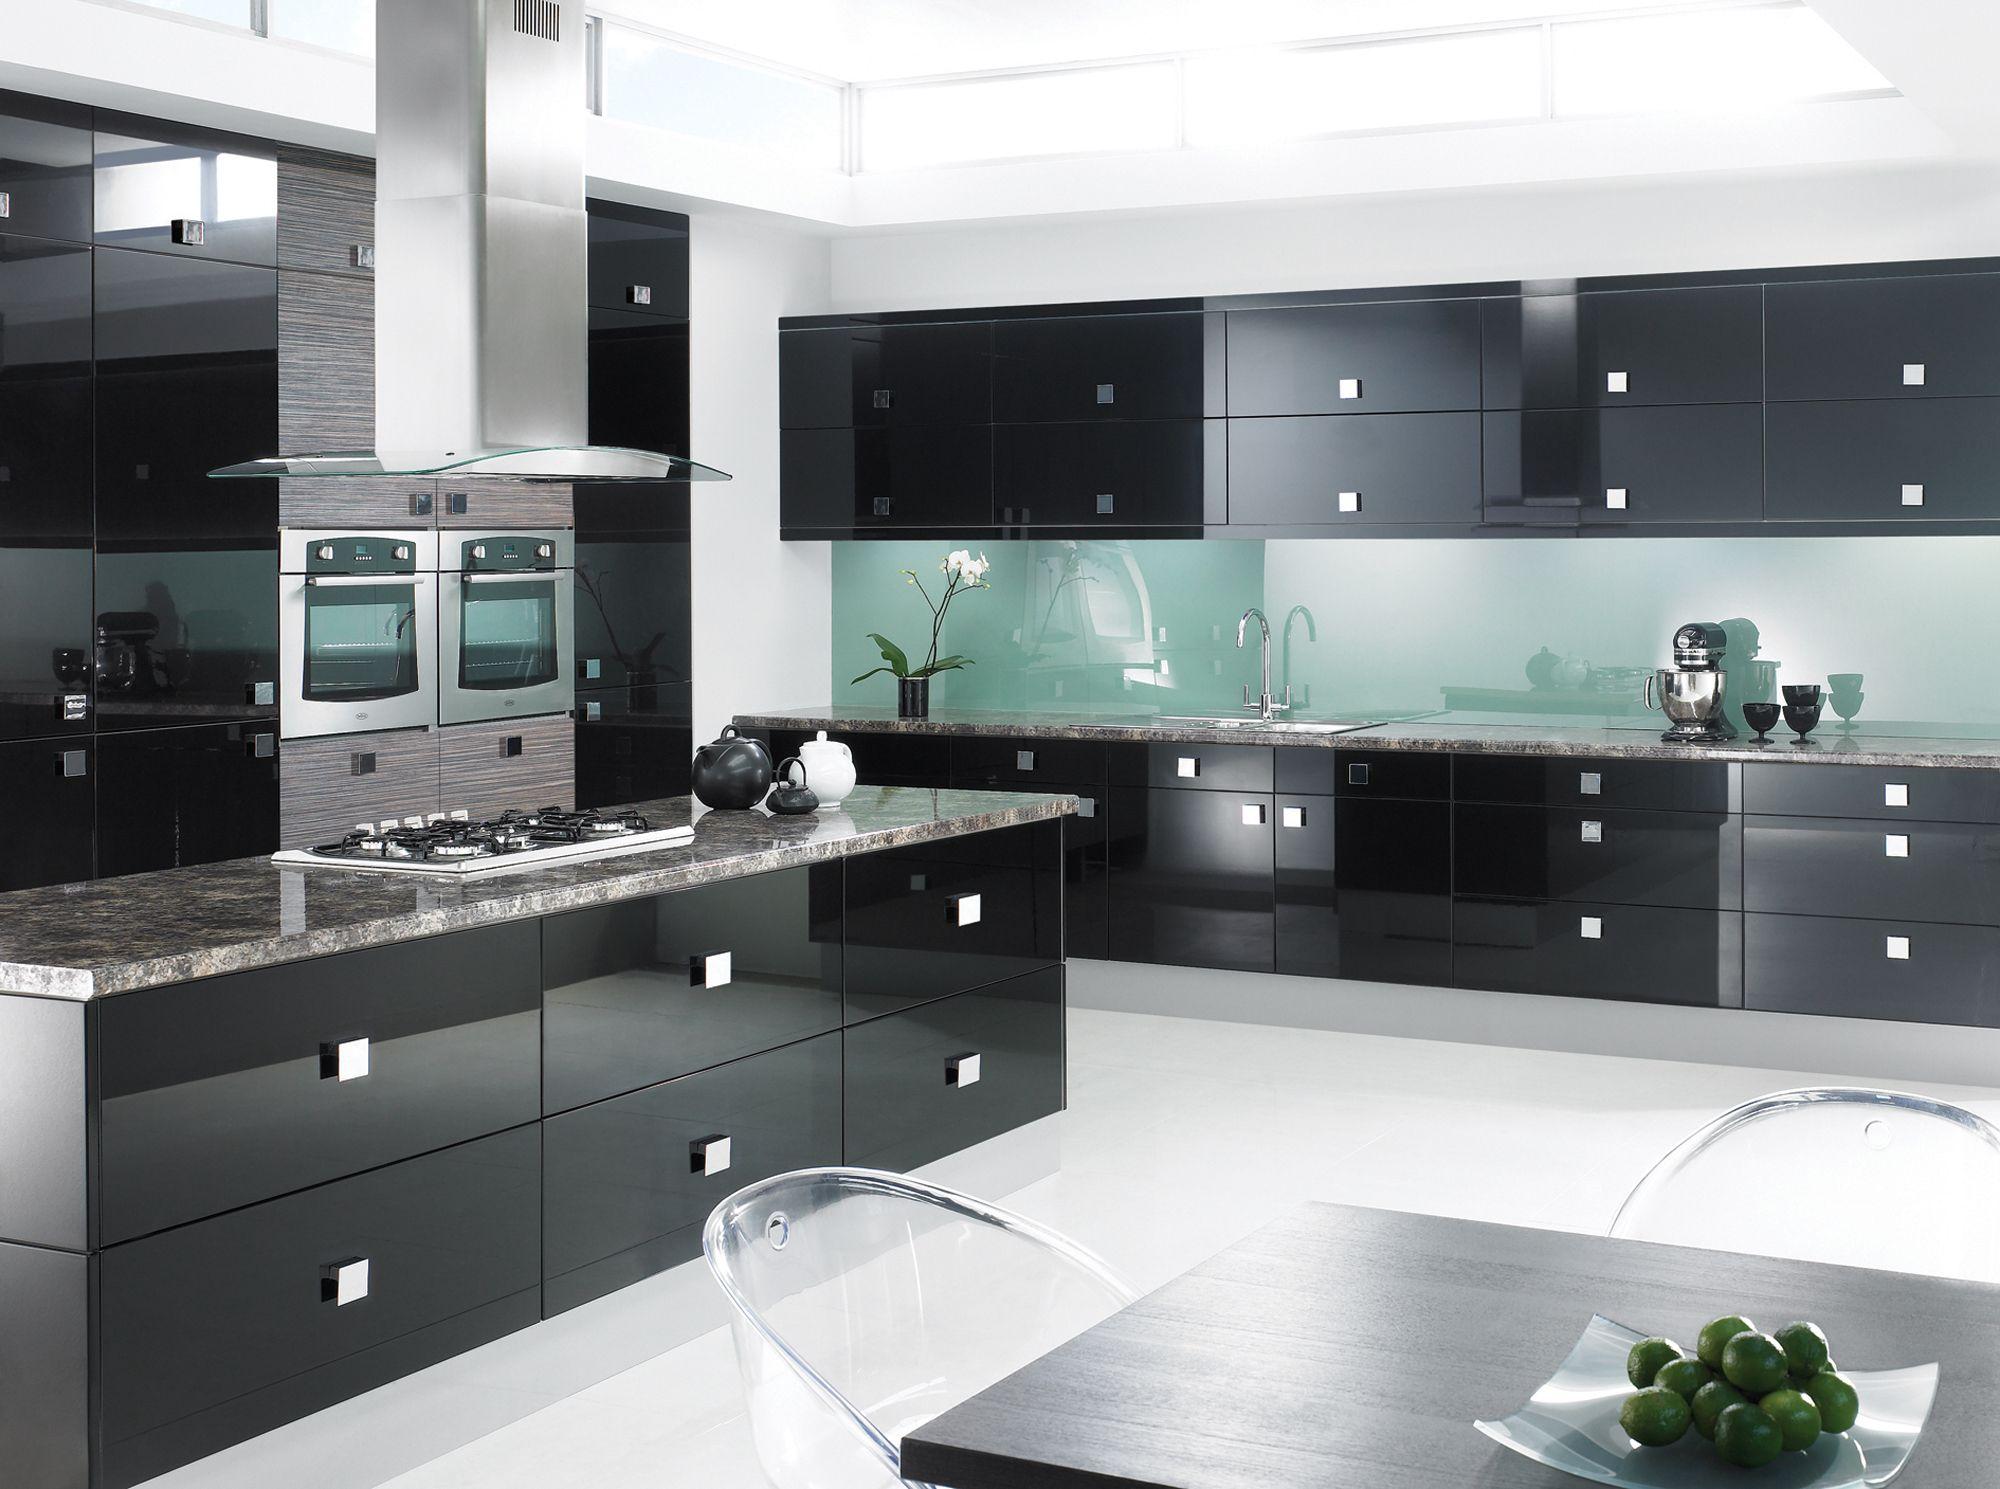 Vinyl Kitchen Cabinet Doors Kitchen Kitchen Images Kitchen Design Remodel White And Black